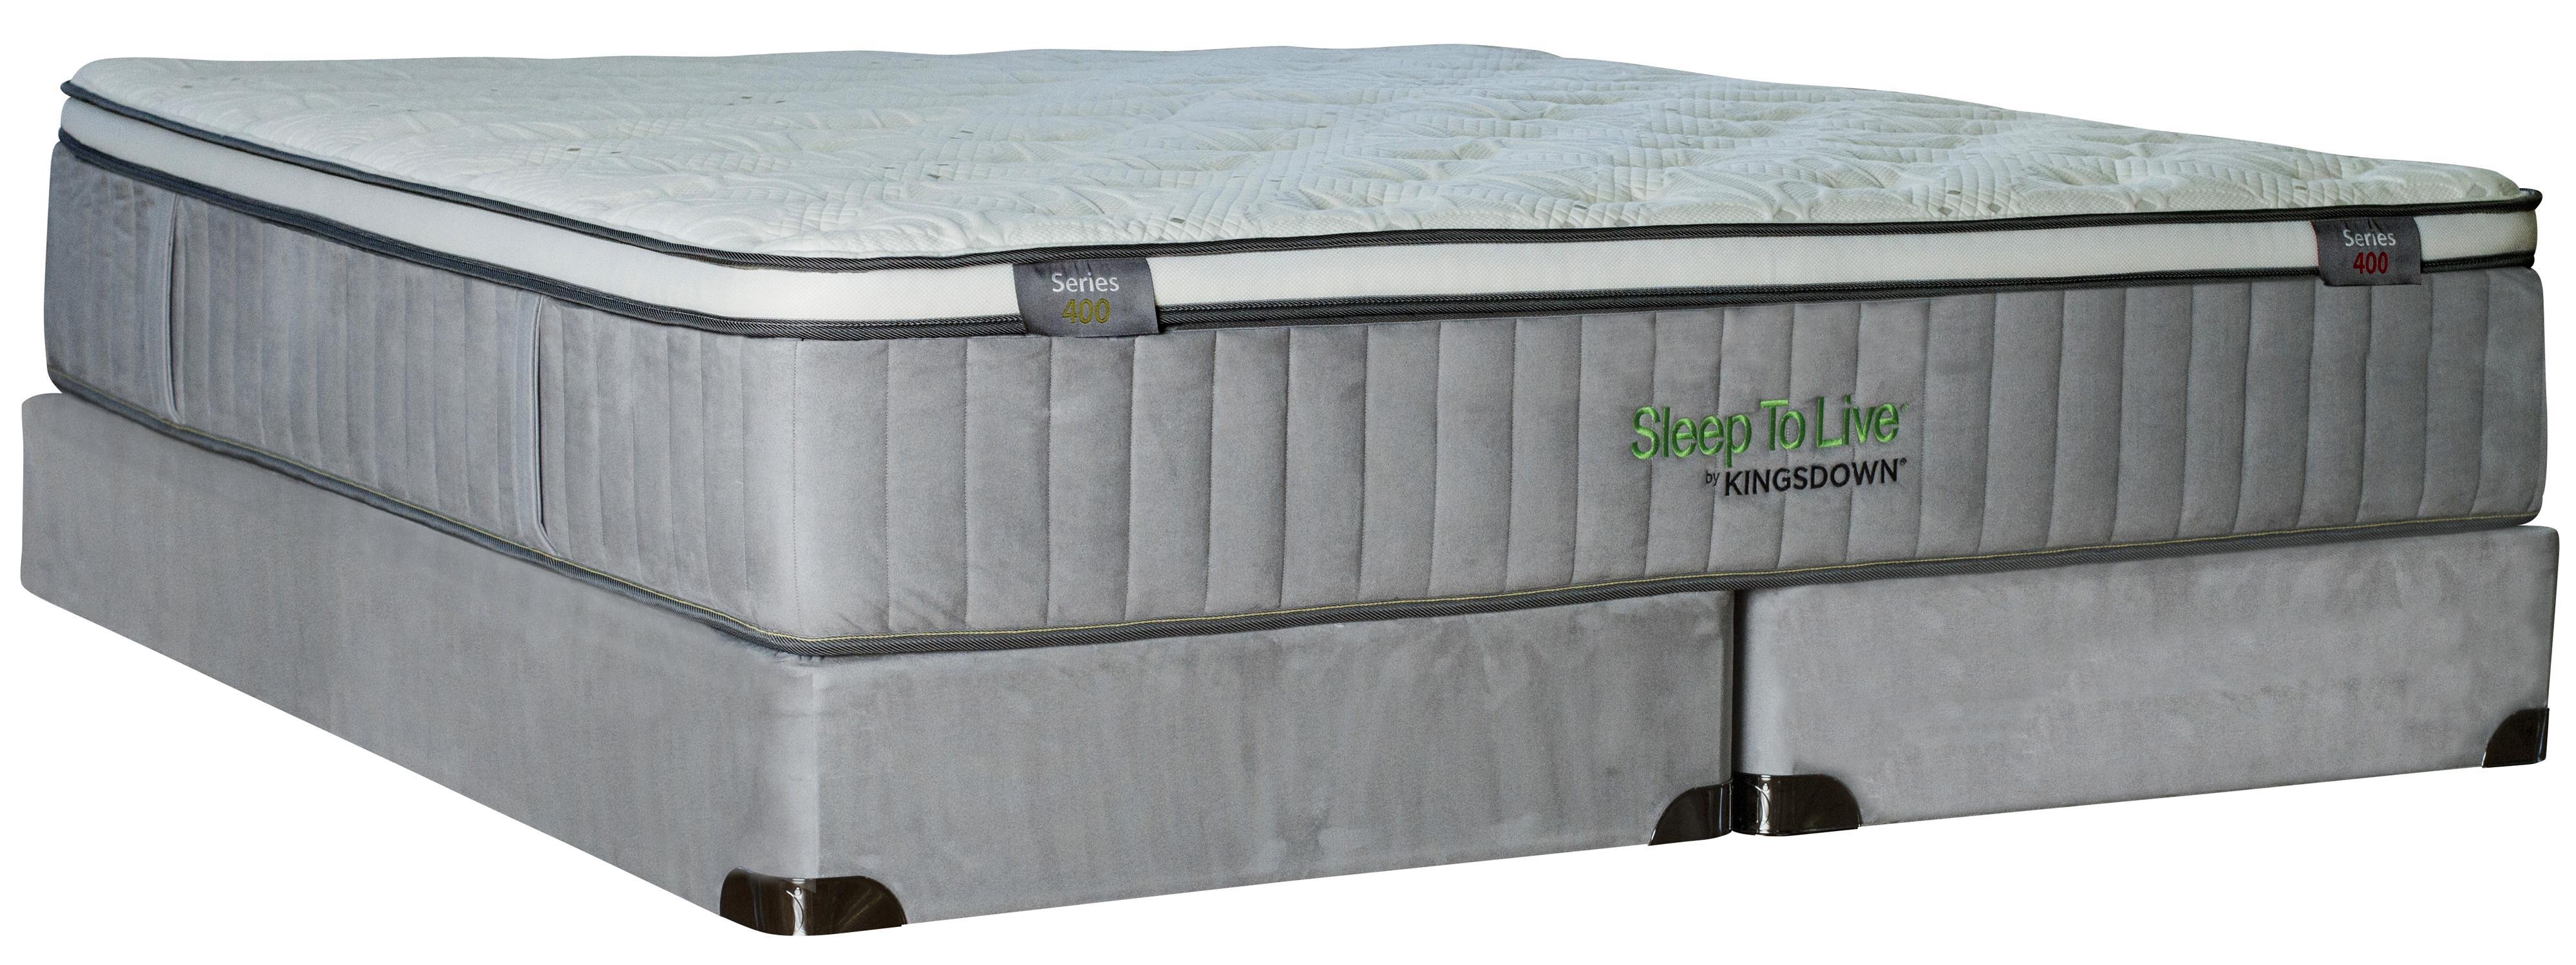 Kingsdown Sleep To Live 400 Queen Euro Top Mattress with Gel Memory Foam - Item Number: Series400-Q